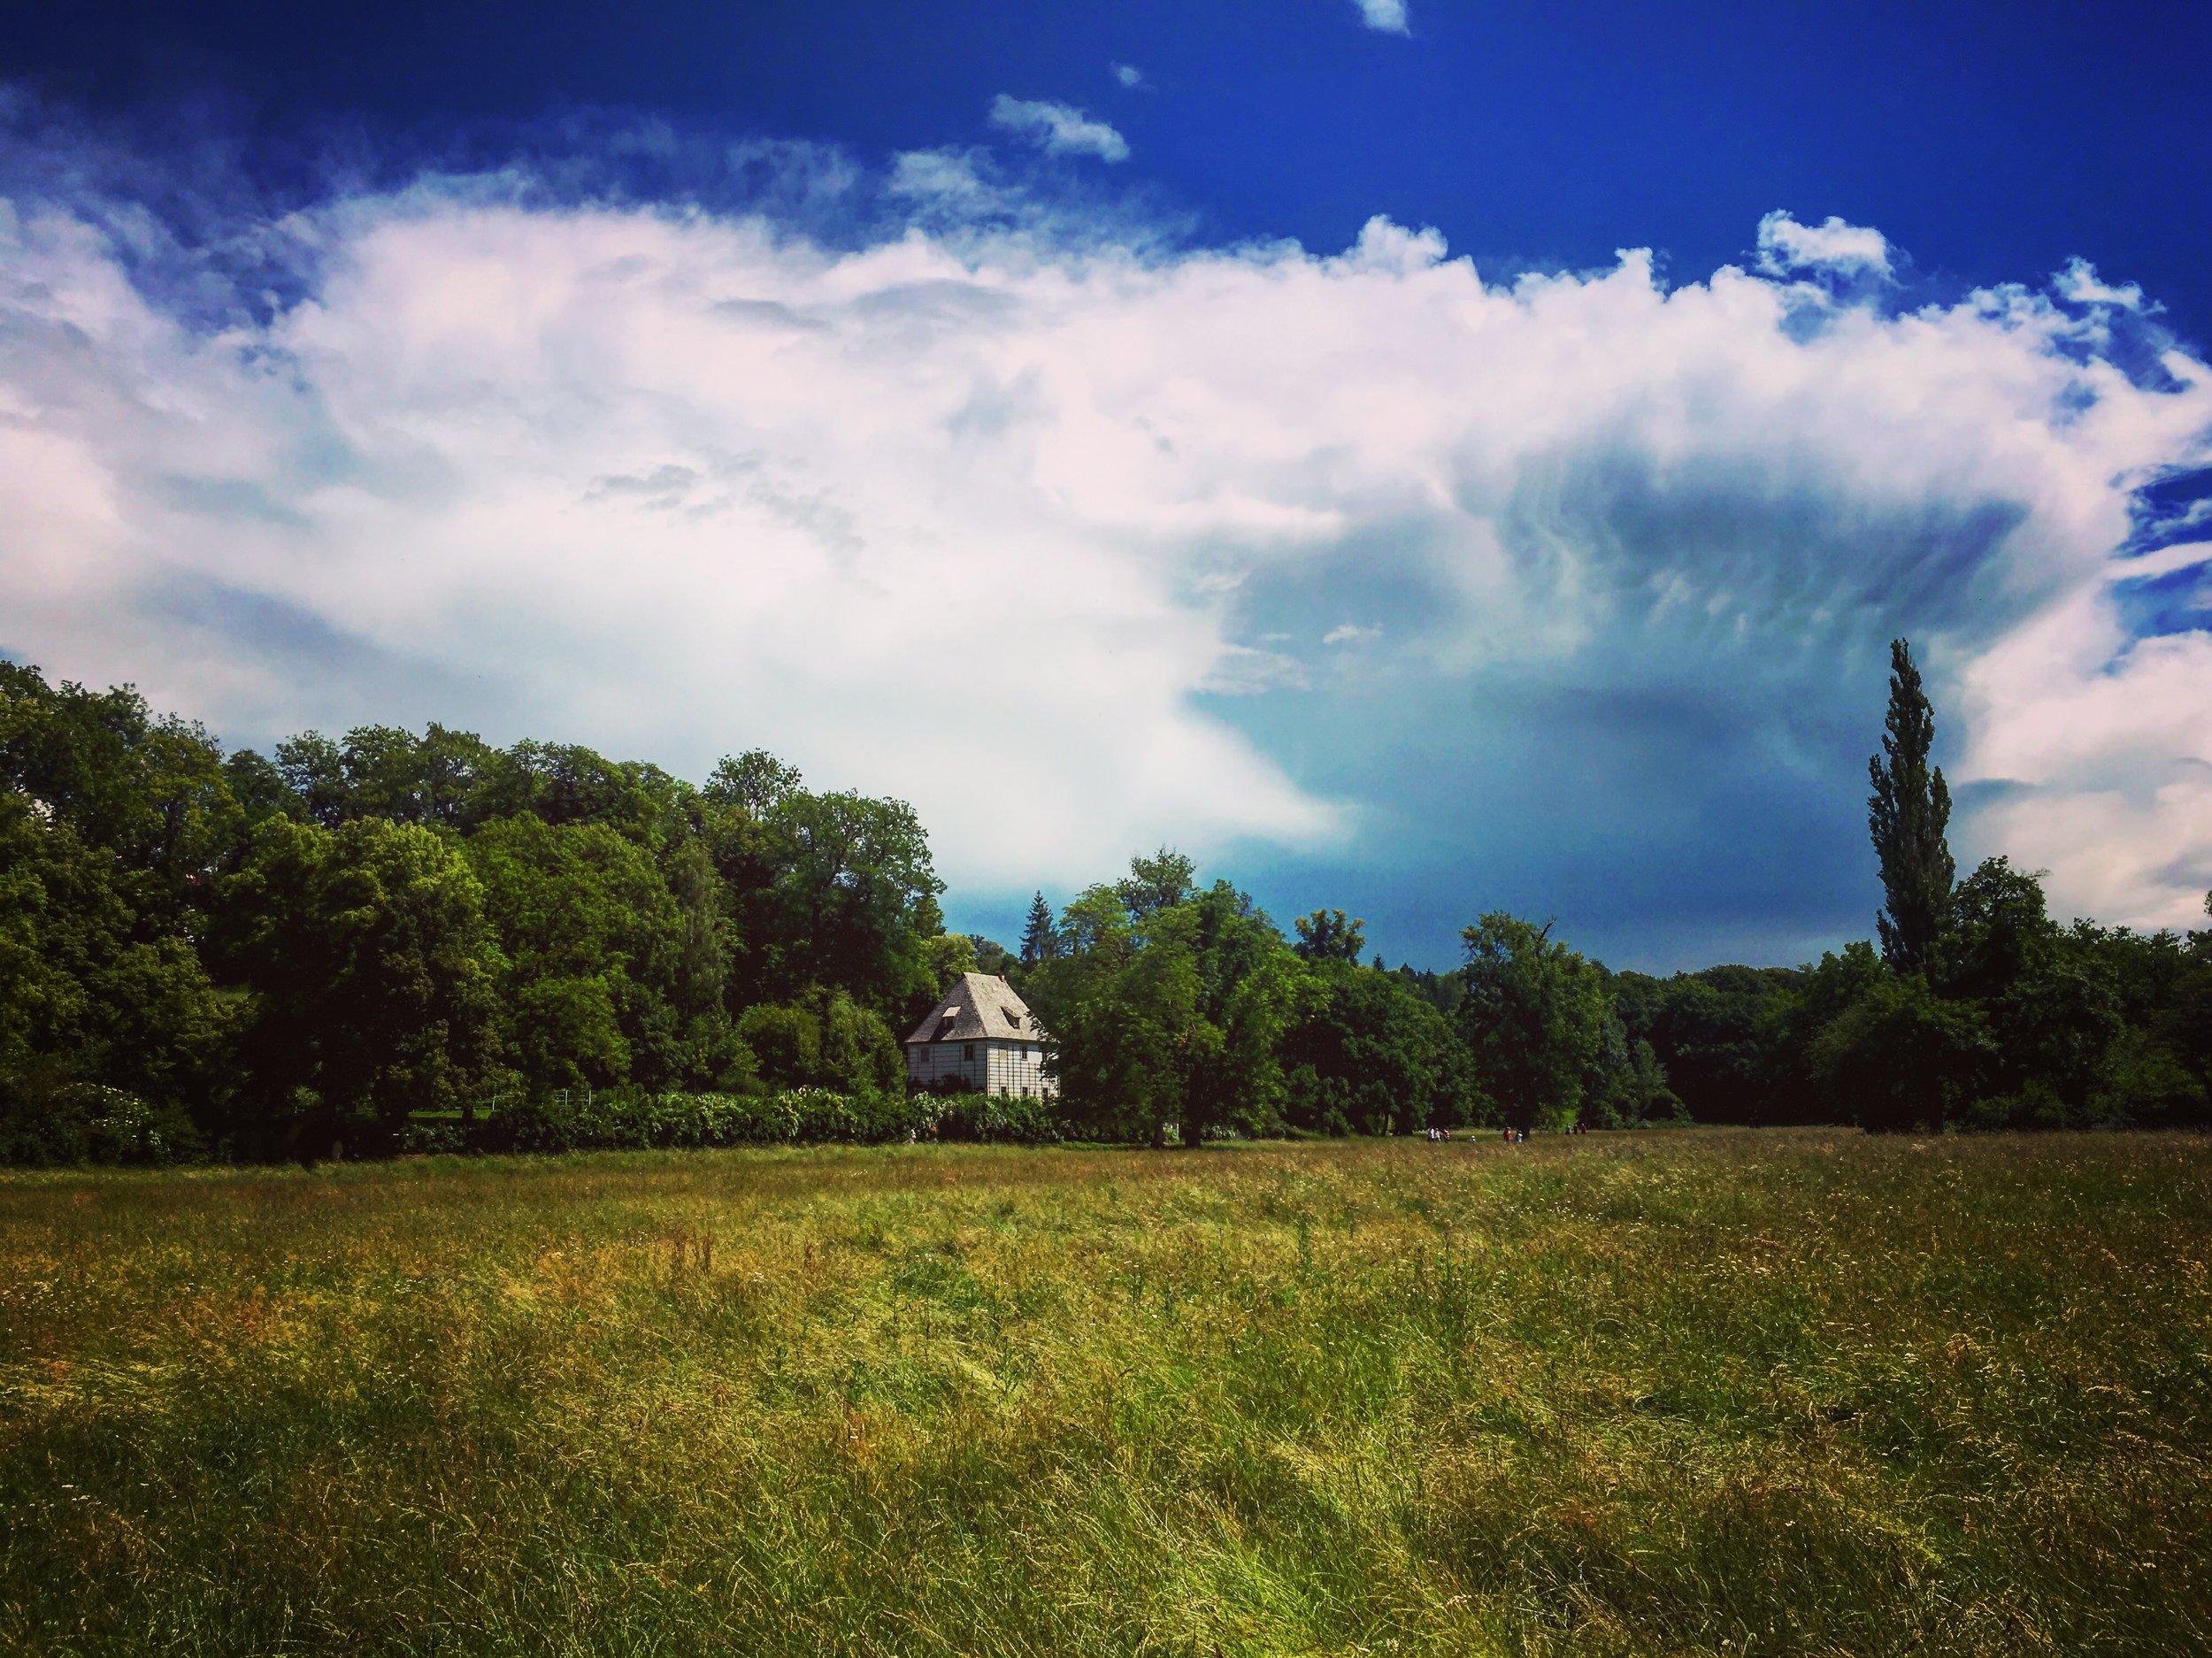 Goethe's House in the Park an der Ilm in Weimar (PHOTO: Ken Chitwood)